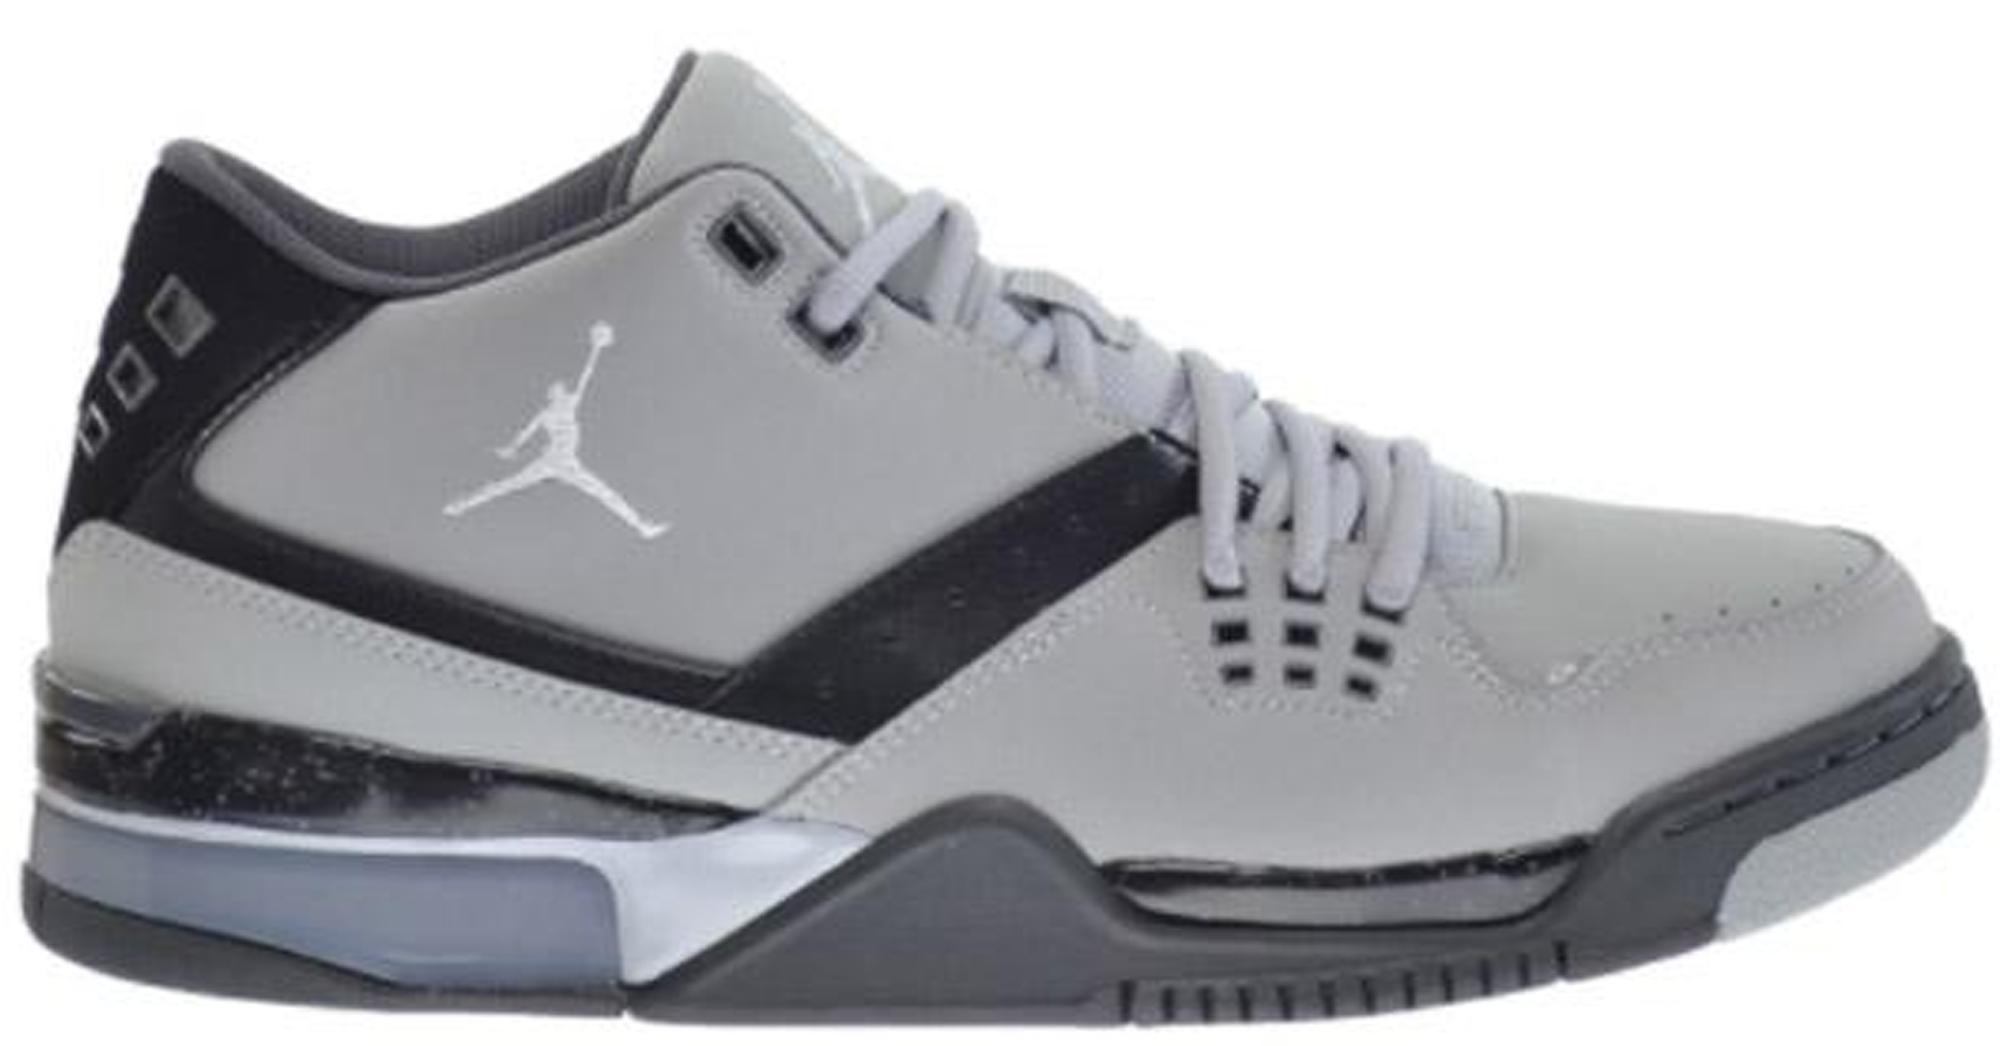 Jordan Flight 23 Wolf Grey - 317820-019